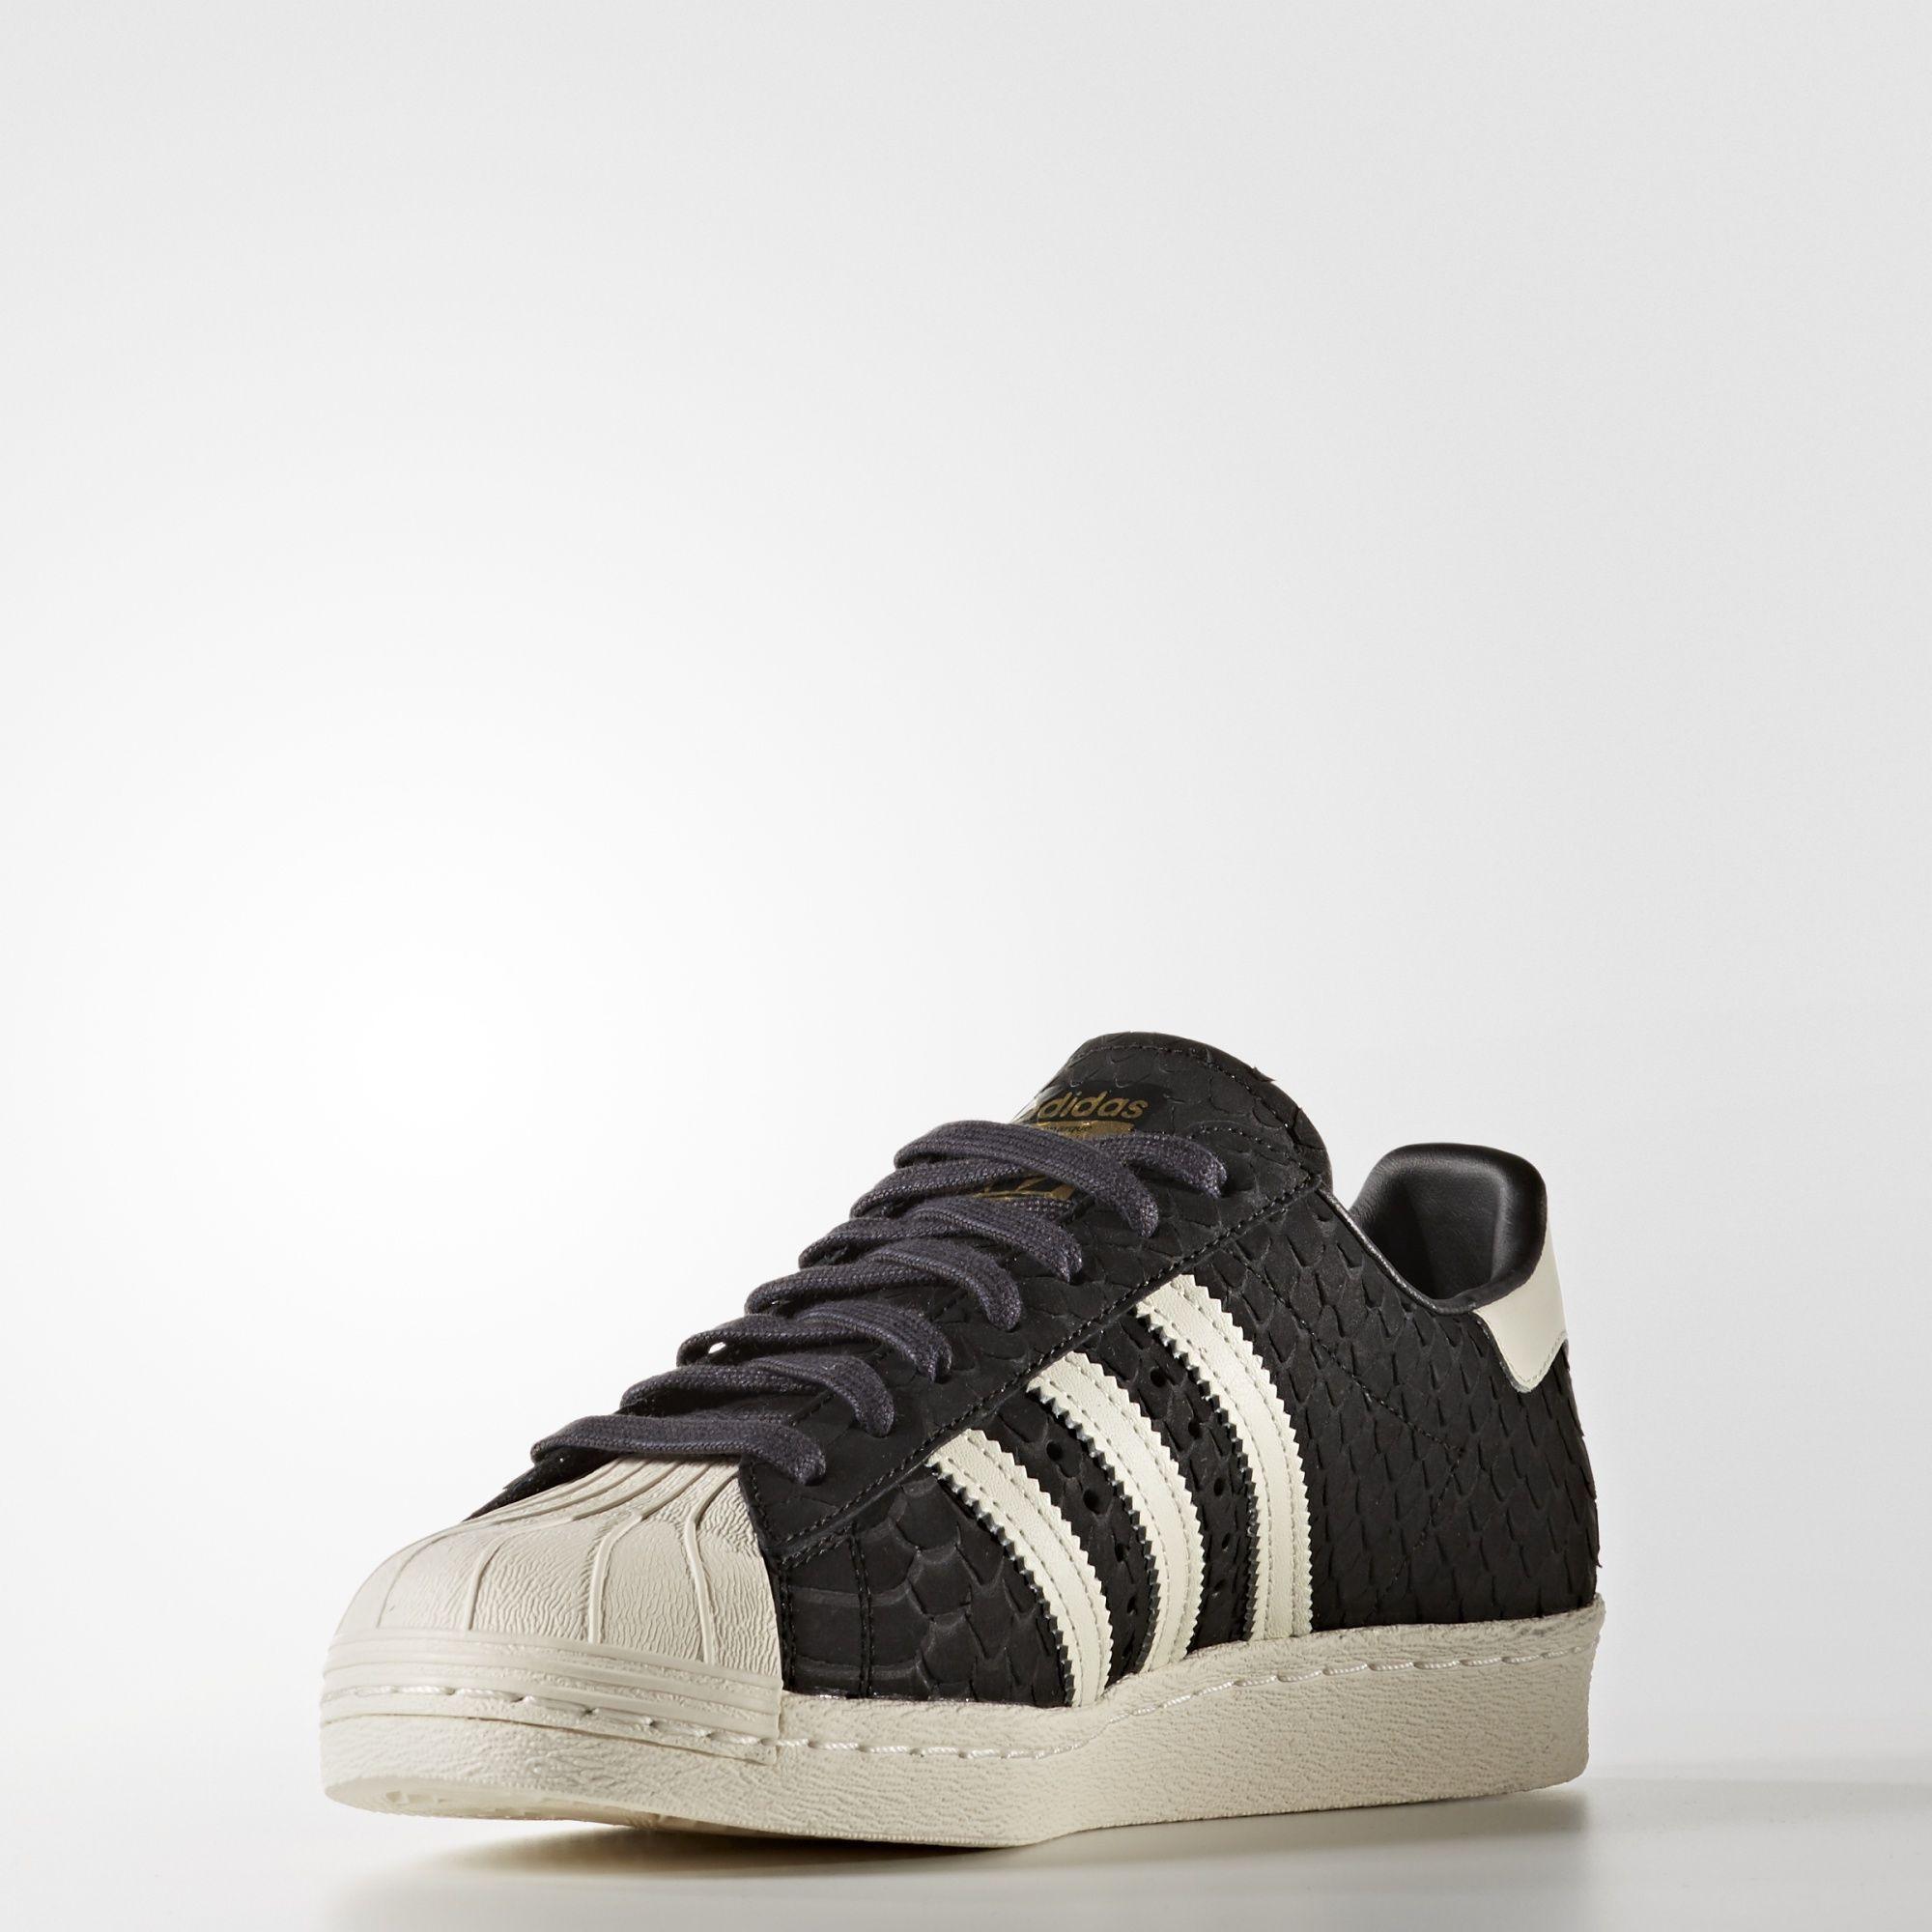 adidas superstar degli anni '80 le scarpe vestiti pinterest scarpe adidas, 80